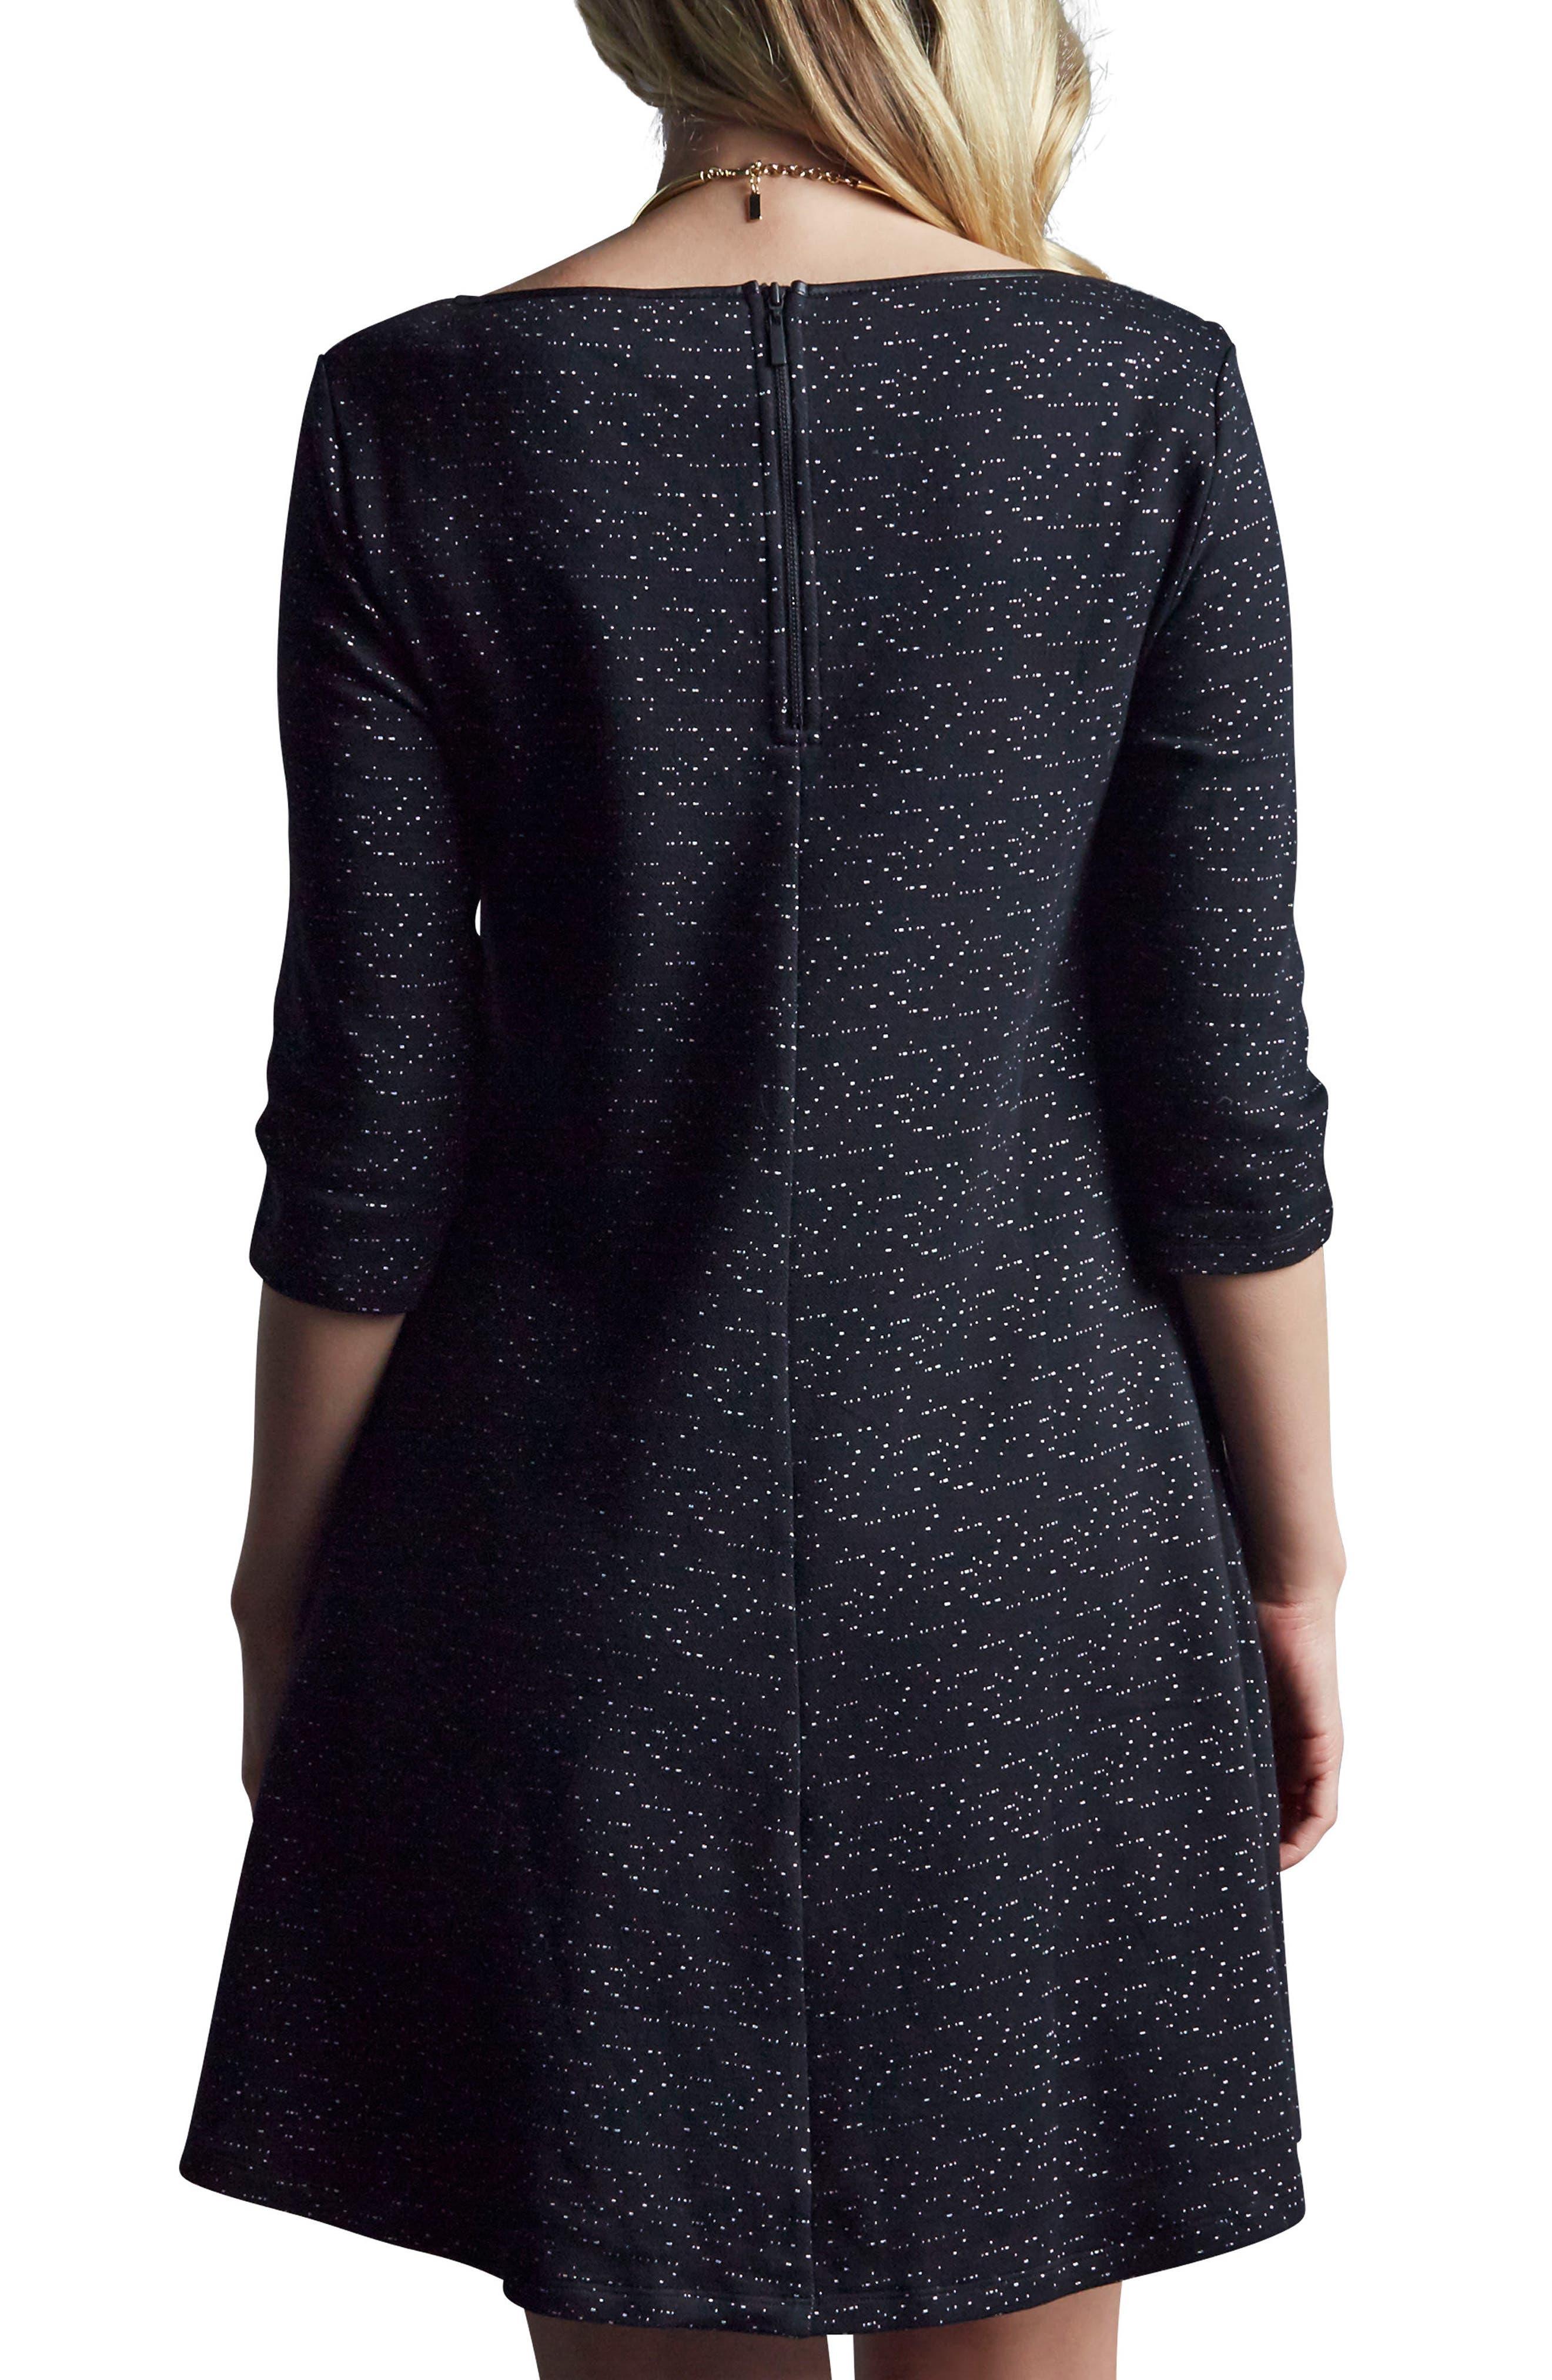 Kate Maternity Dress,                             Alternate thumbnail 2, color,                             Black Space Dye Speckle